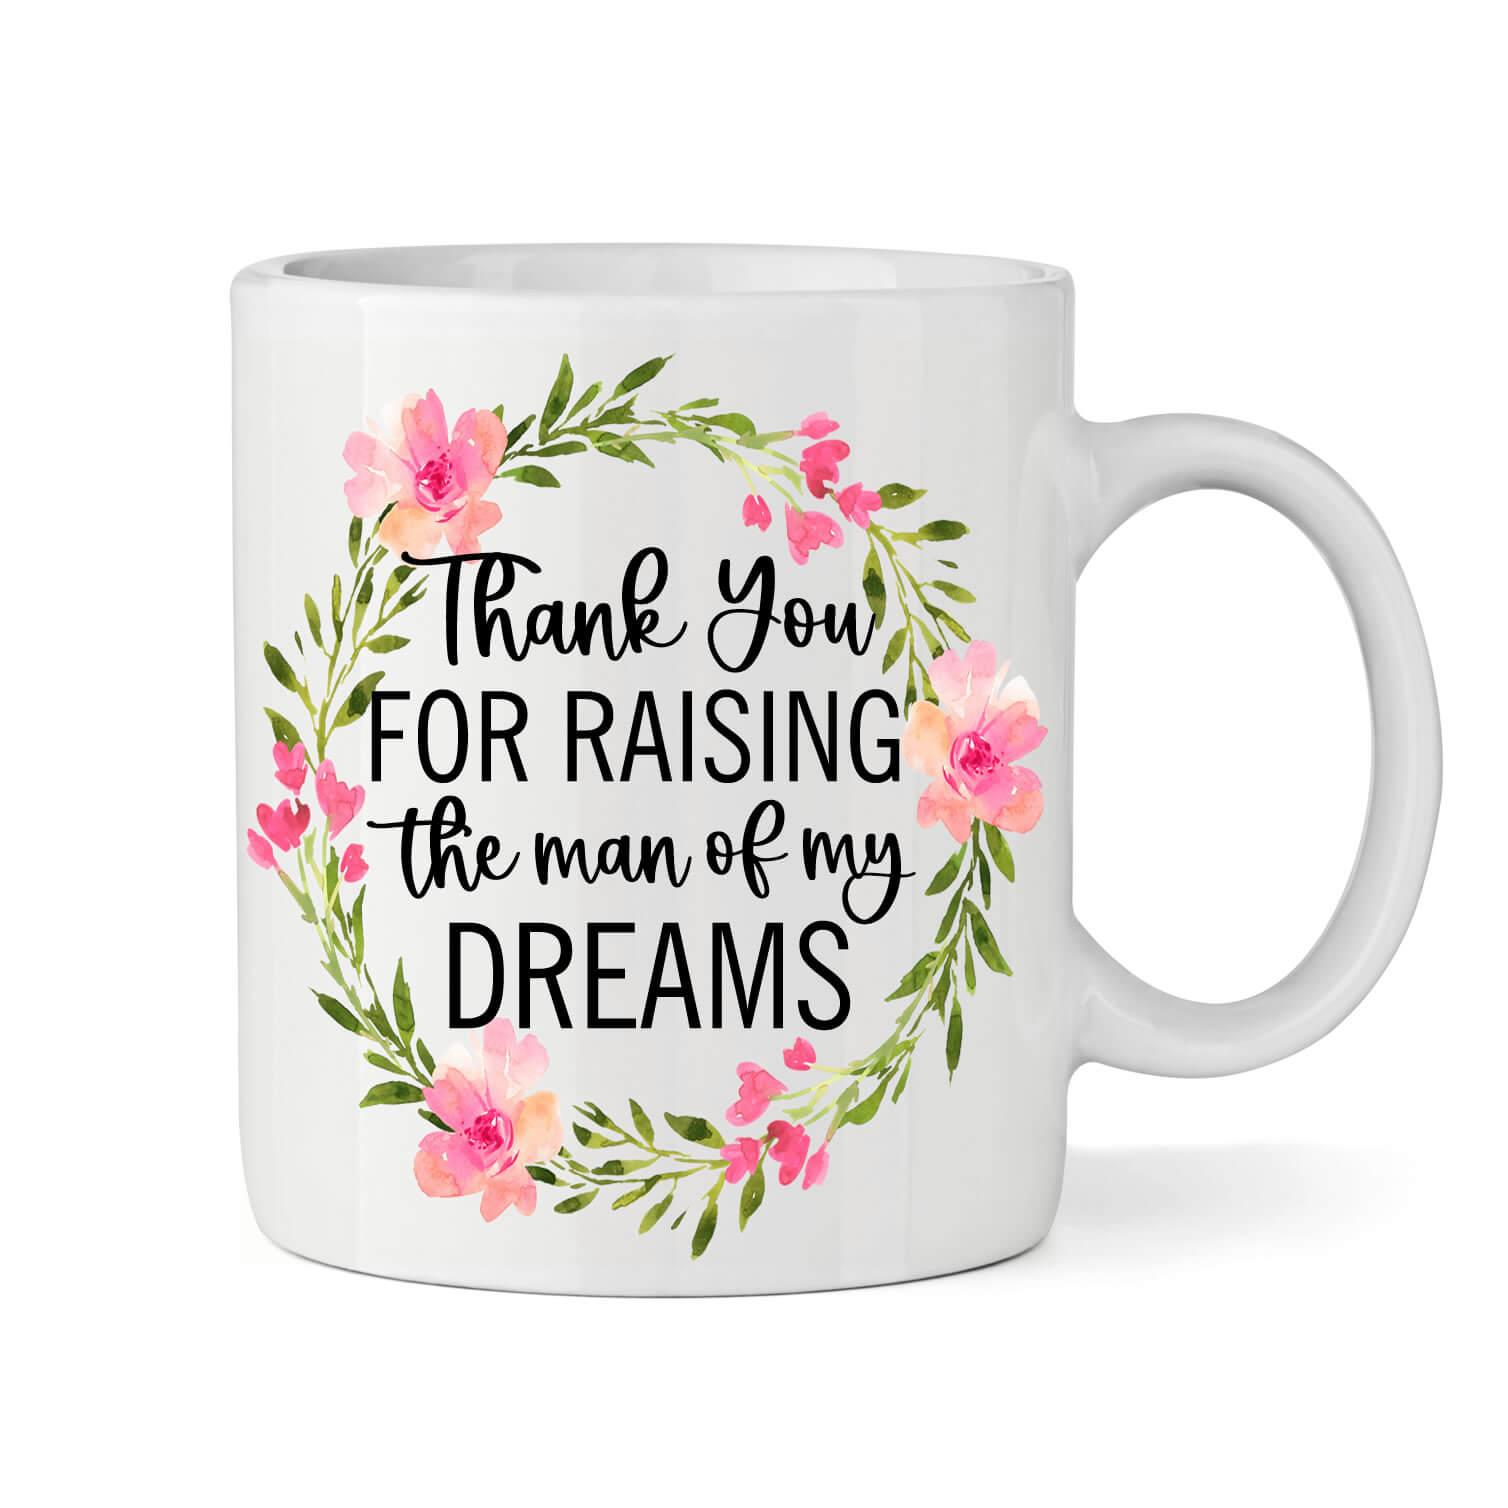 u0026quot thank you for raising the man of my dreams u0026quot  mug